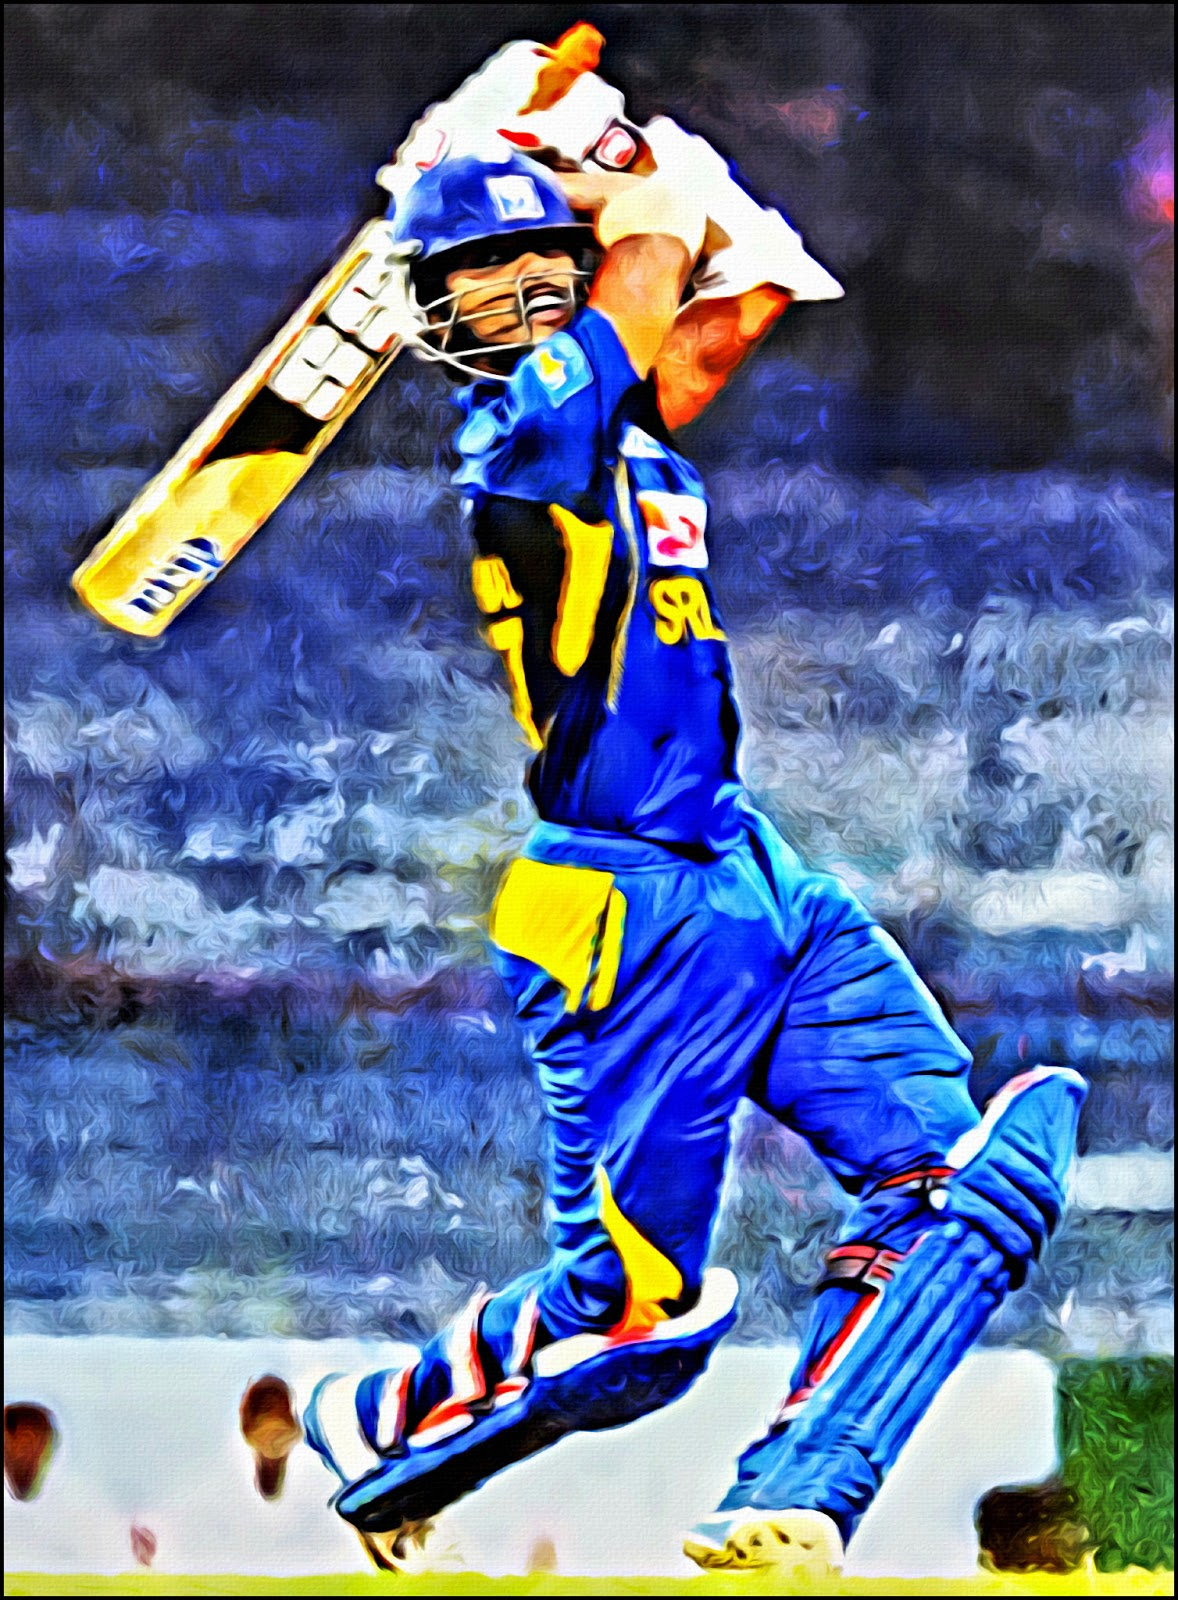 Cricket = Action = Art: 2013-07-21